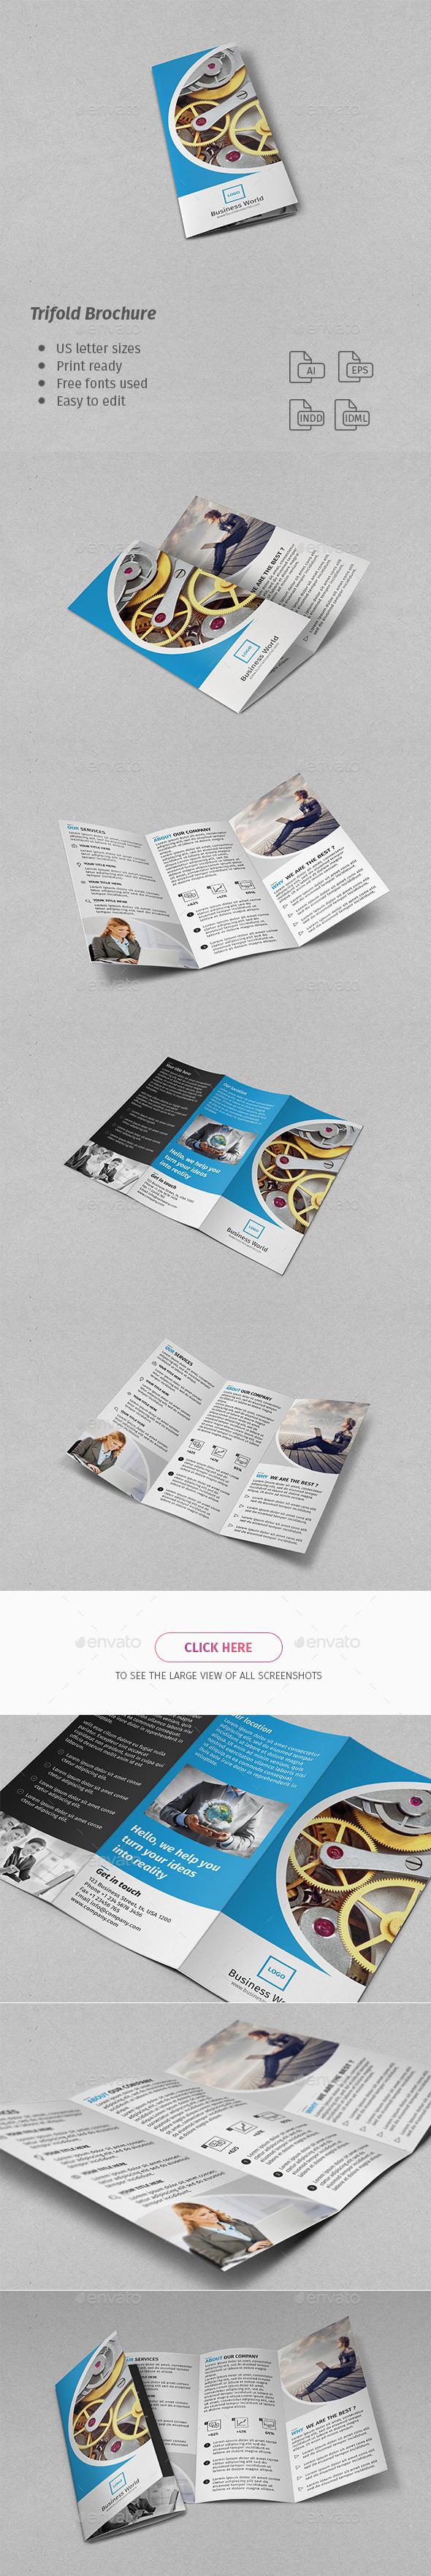 Corporate Trifold Brochure - Corporate Brochures